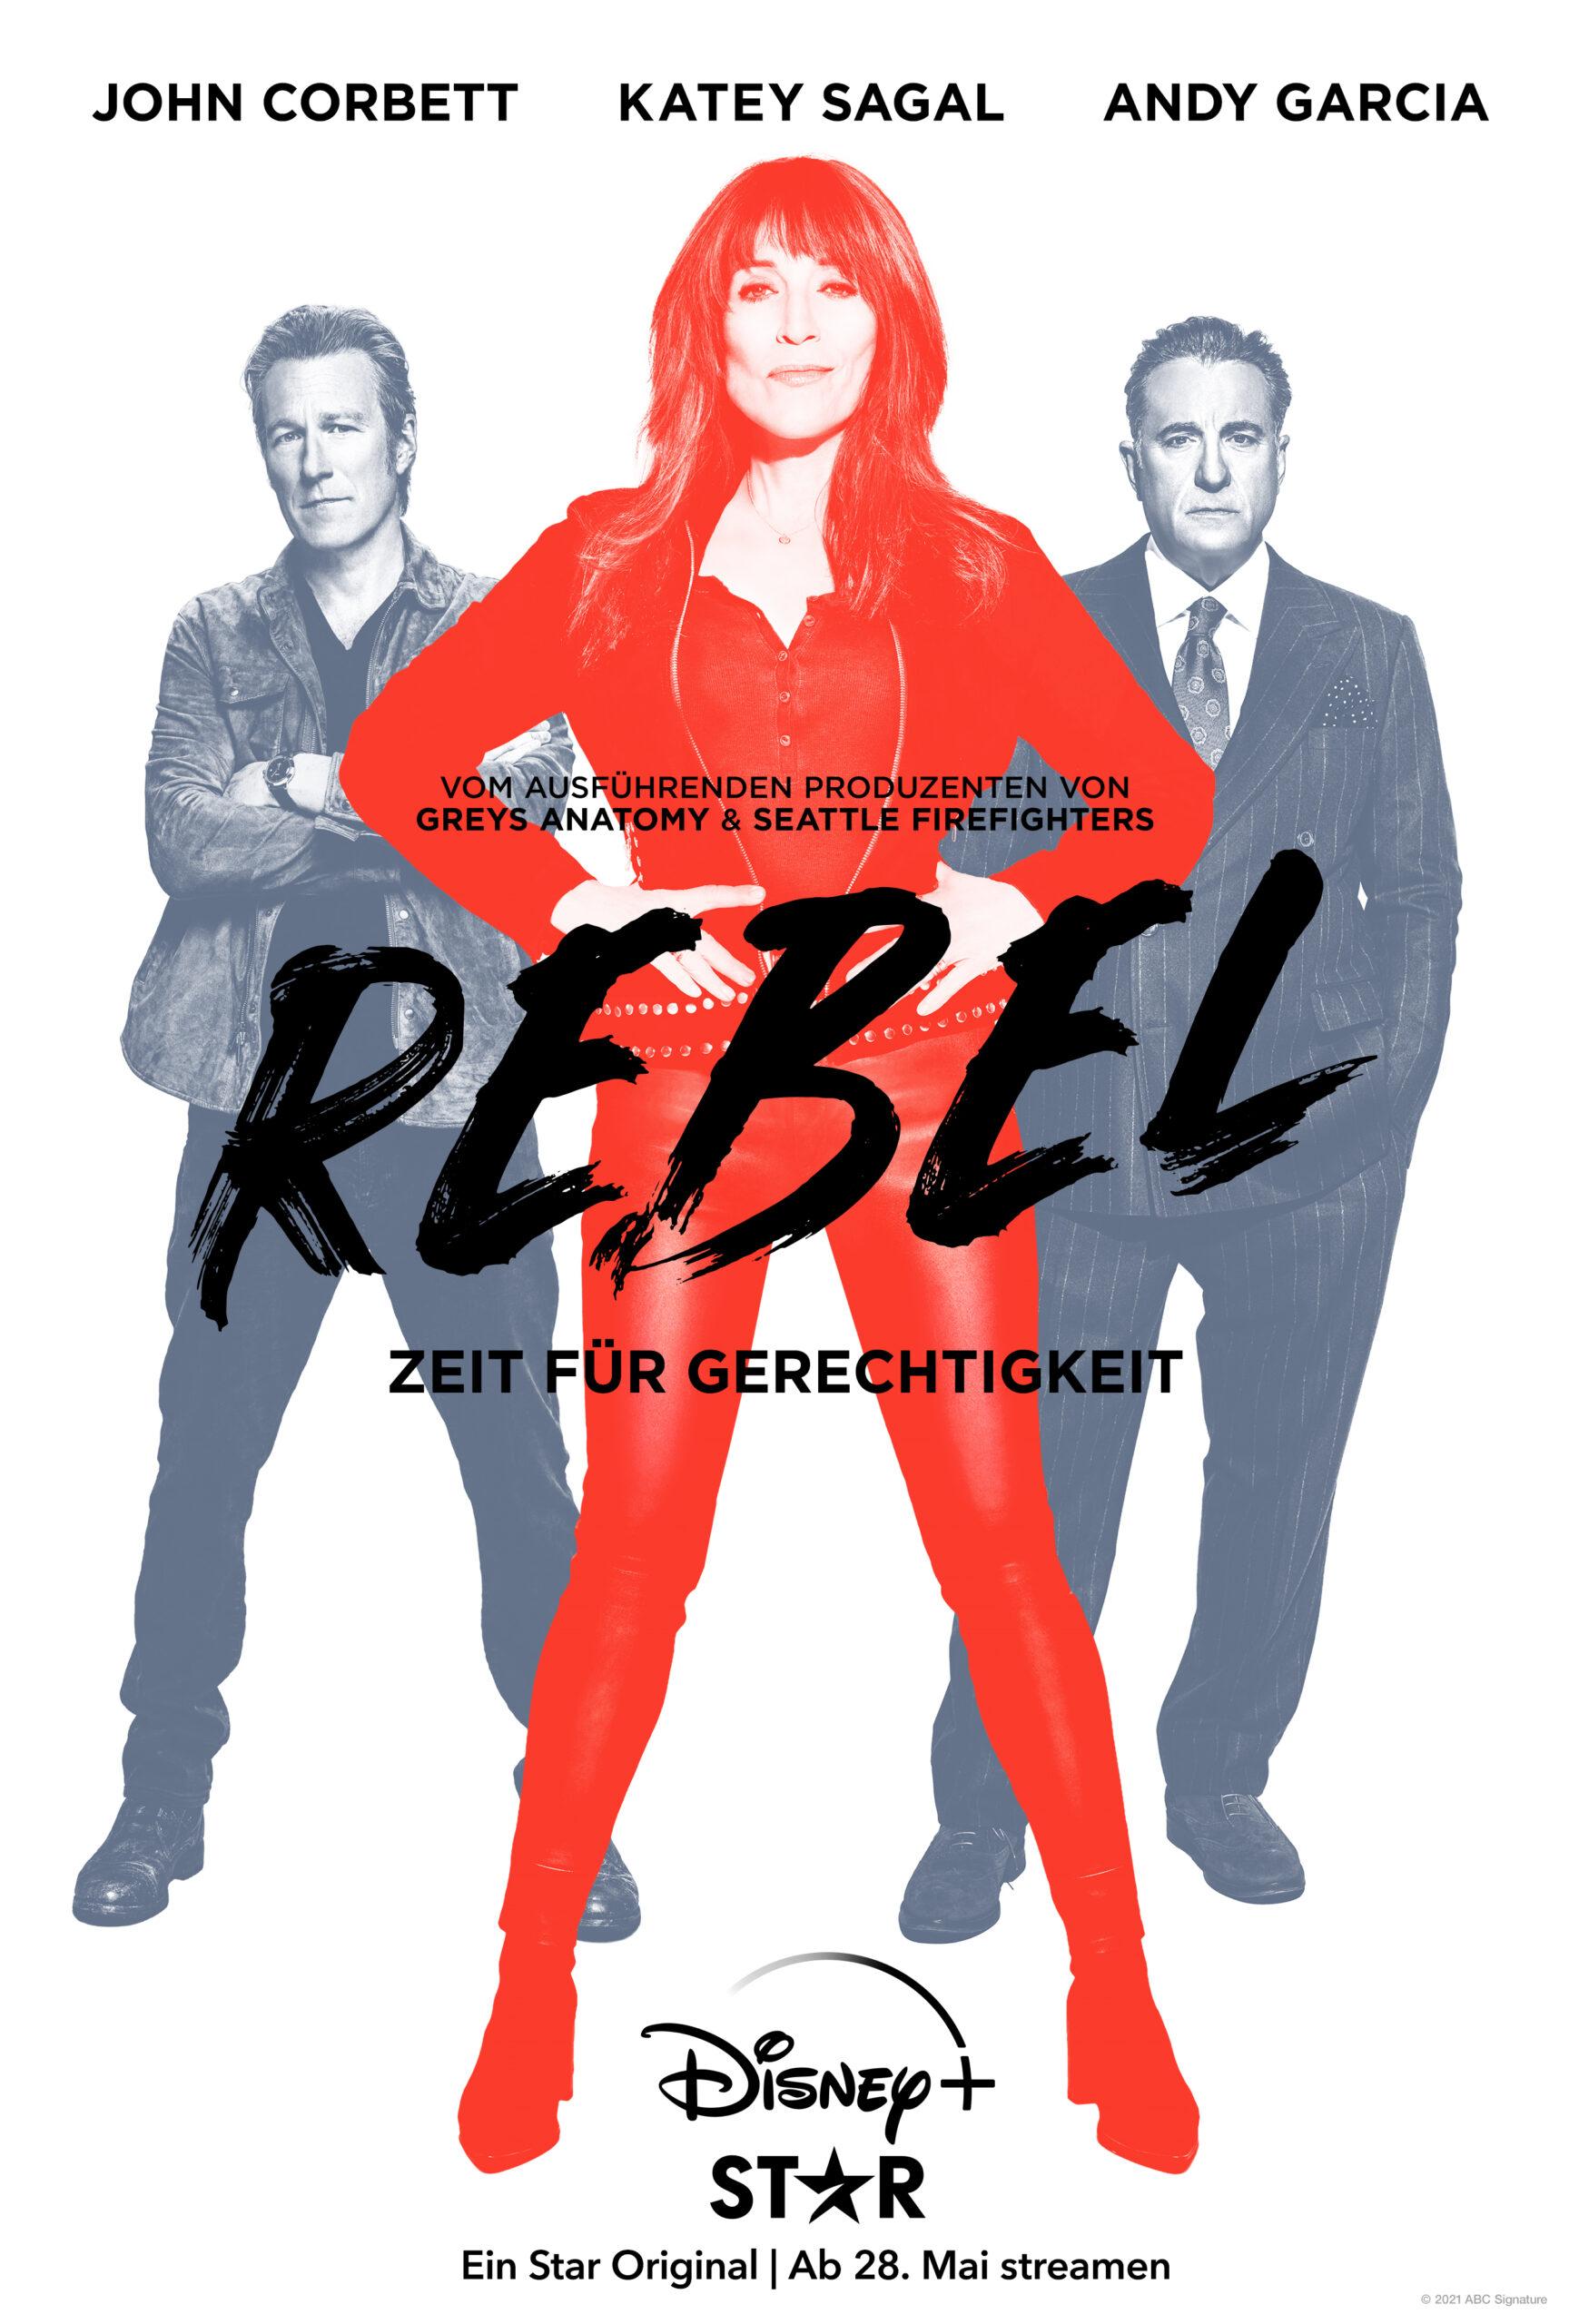 Rebel - Poster - Disney+ - Star